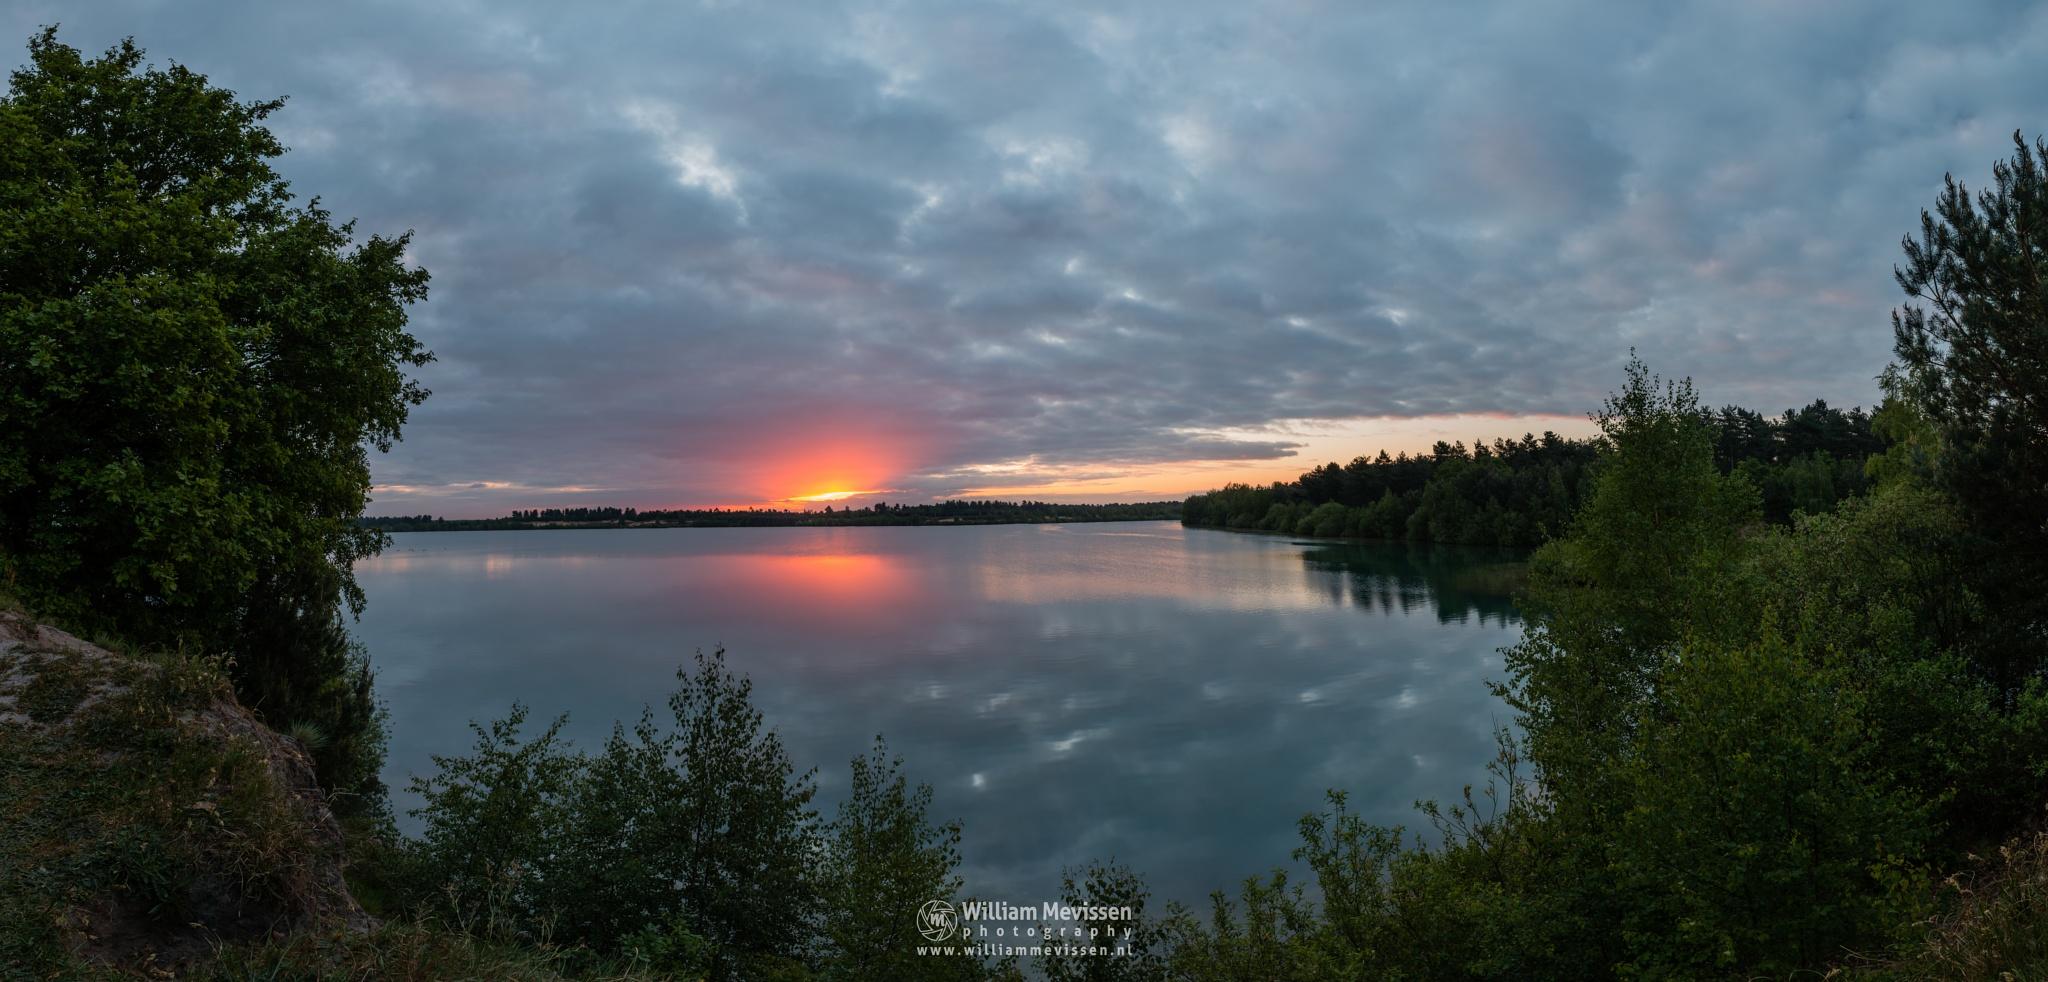 Panorama 'Cloudy Sunrise' by William Mevissen